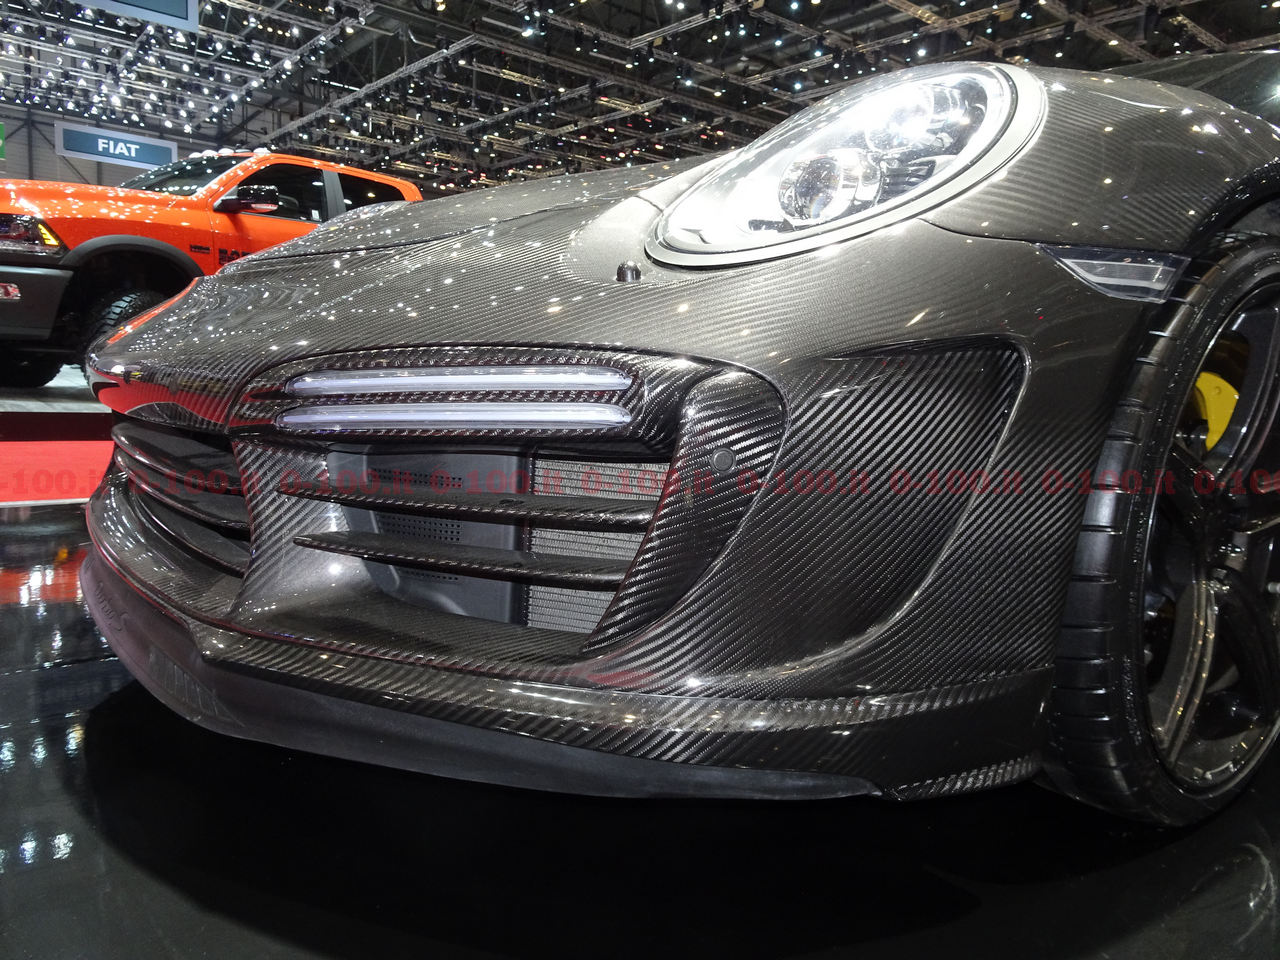 Geneve-ginevra-geneva-2017_tuning-top-car-porsche-991-2-gtr_0-100_14